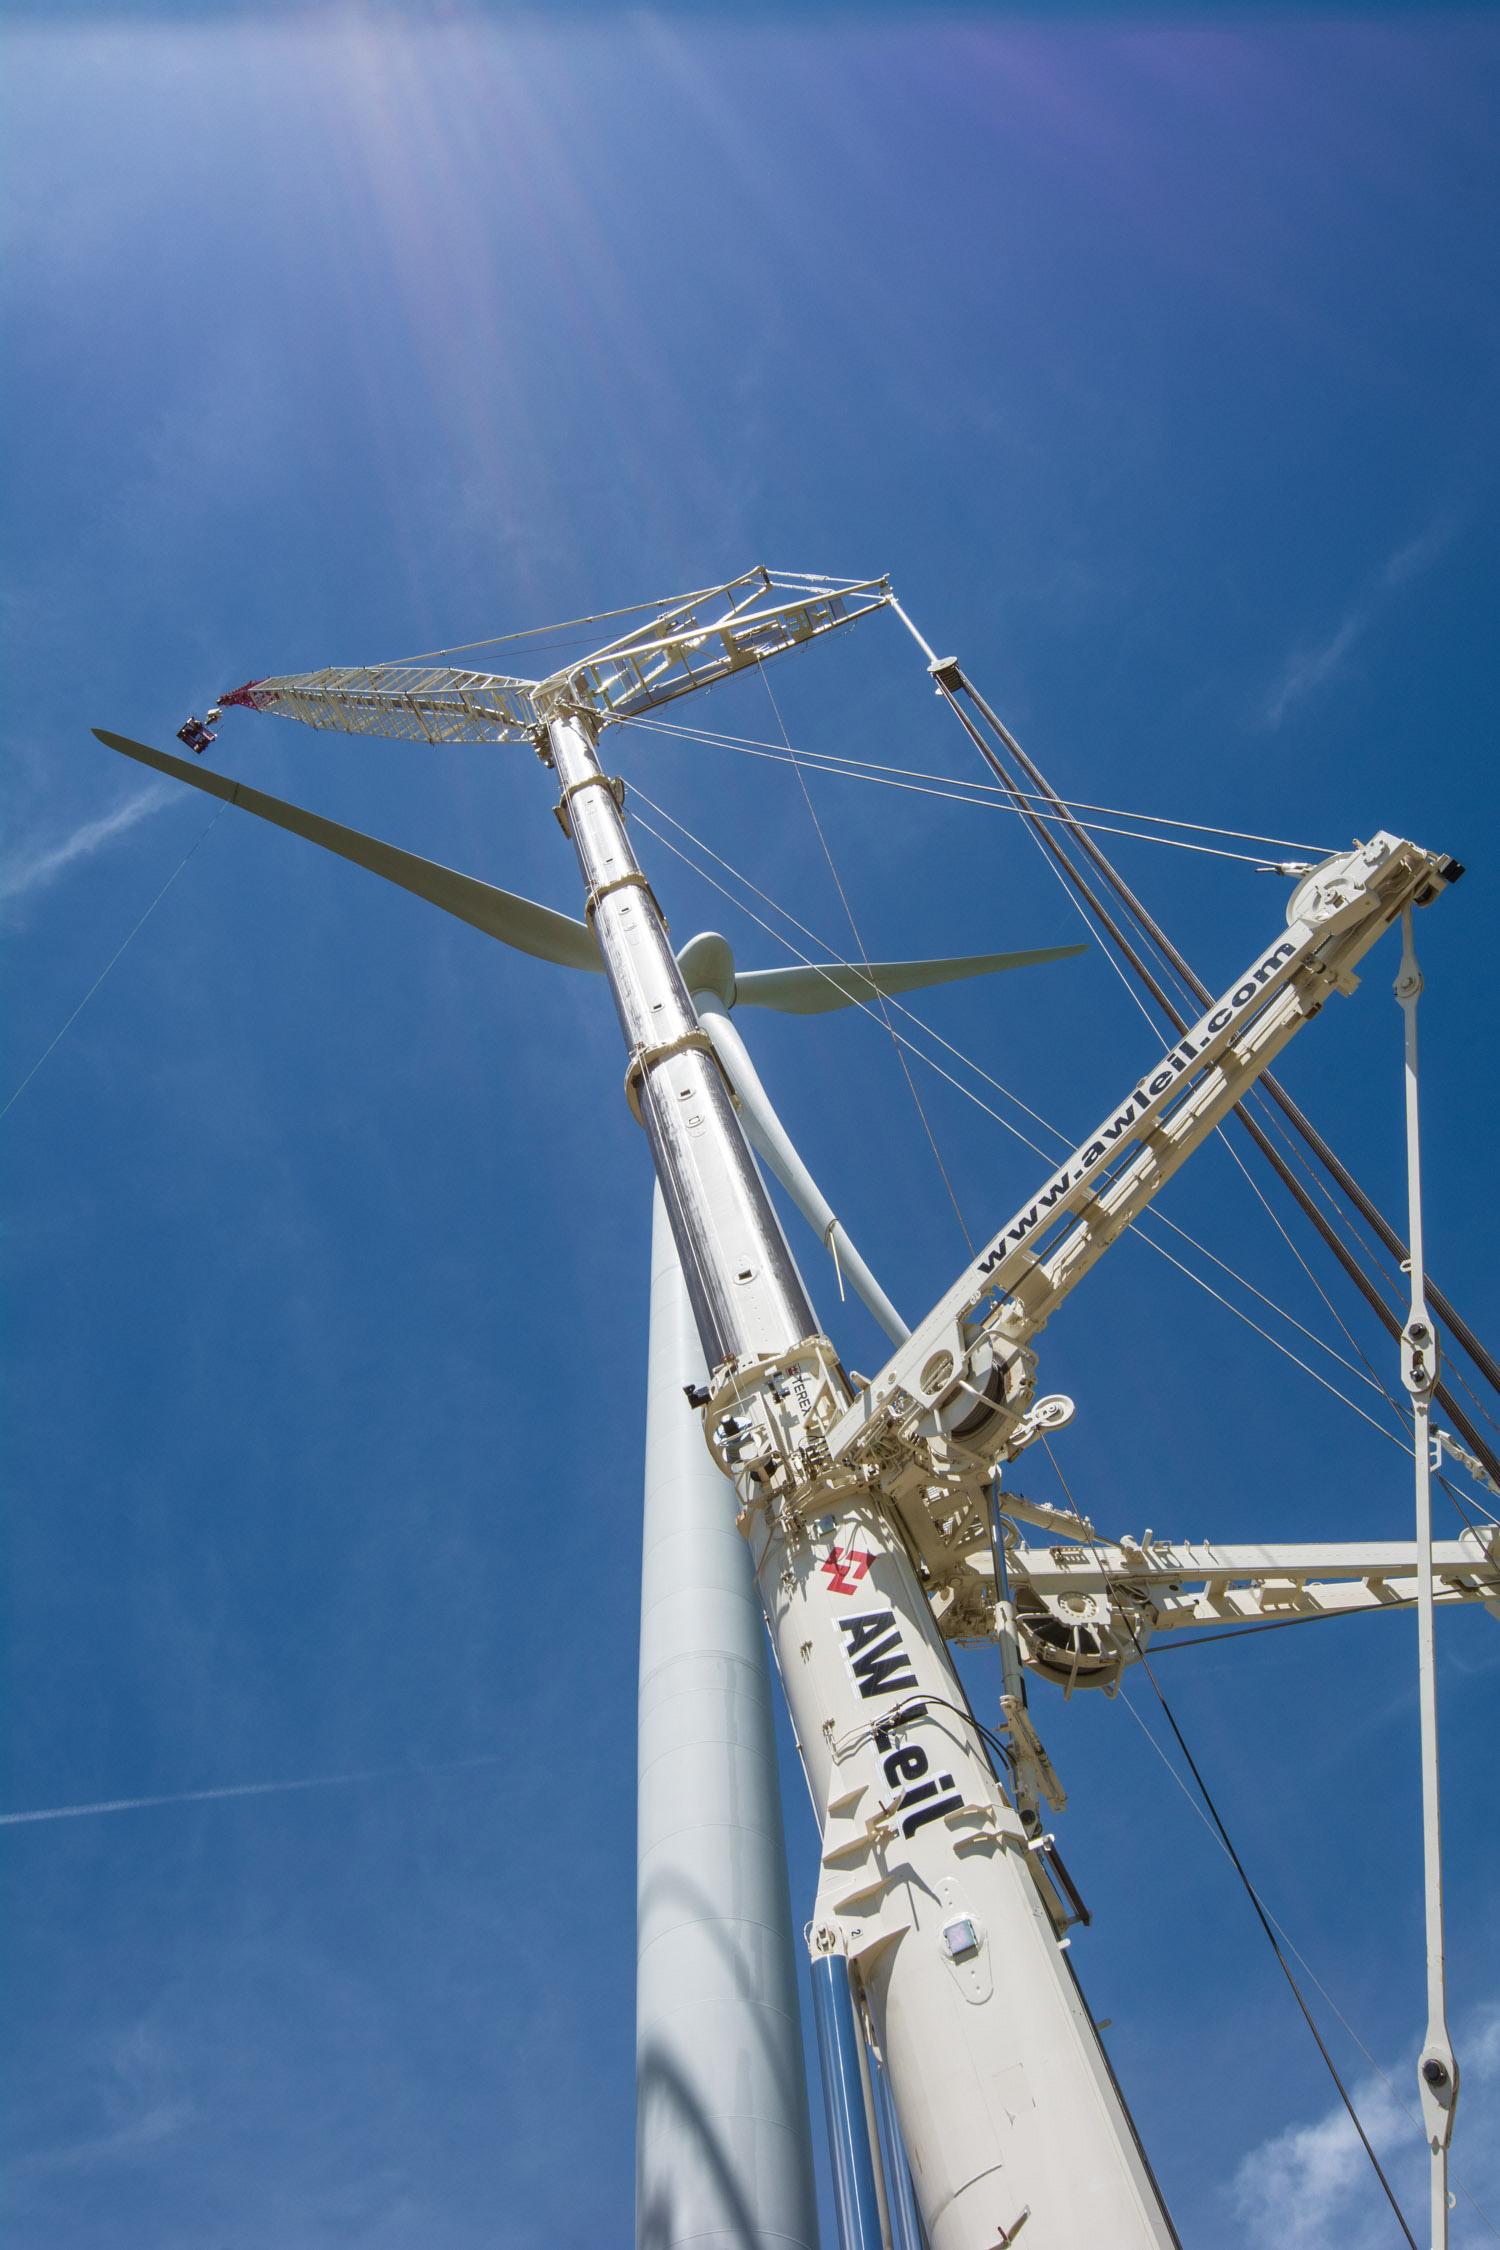 june09 2014-A. W. Leil Cranes and Equipment Limited-promo-Antigonish NS-photo by Aaron McKenzie Fraser-www.amfraser.com-7121.jpg